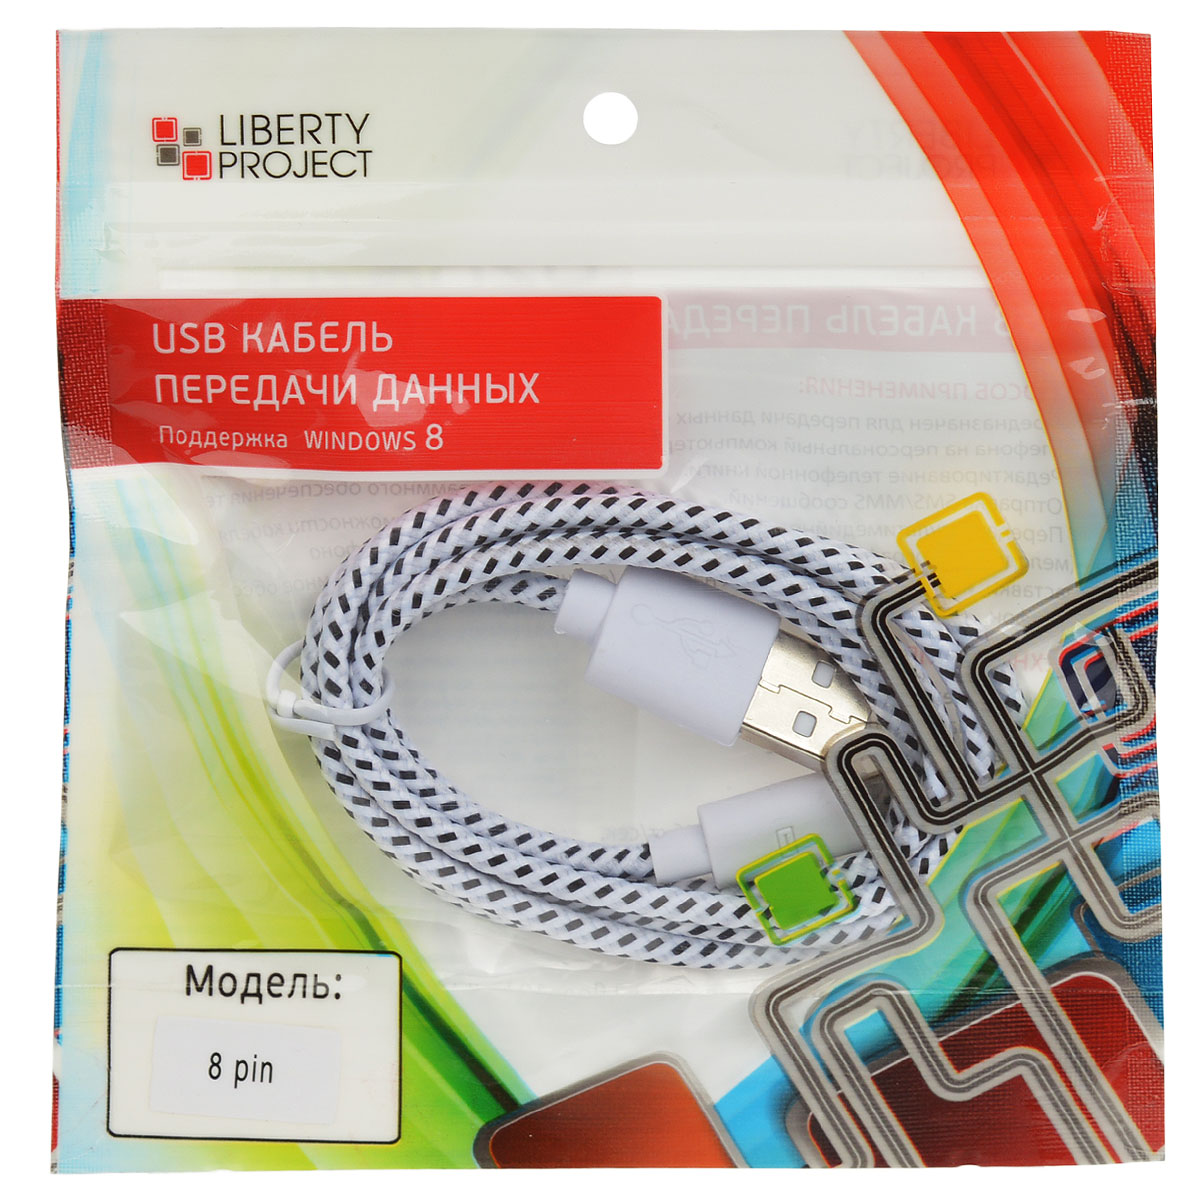 Liberty Project дата-кабель Apple Lightning в оплетке, White Black цена